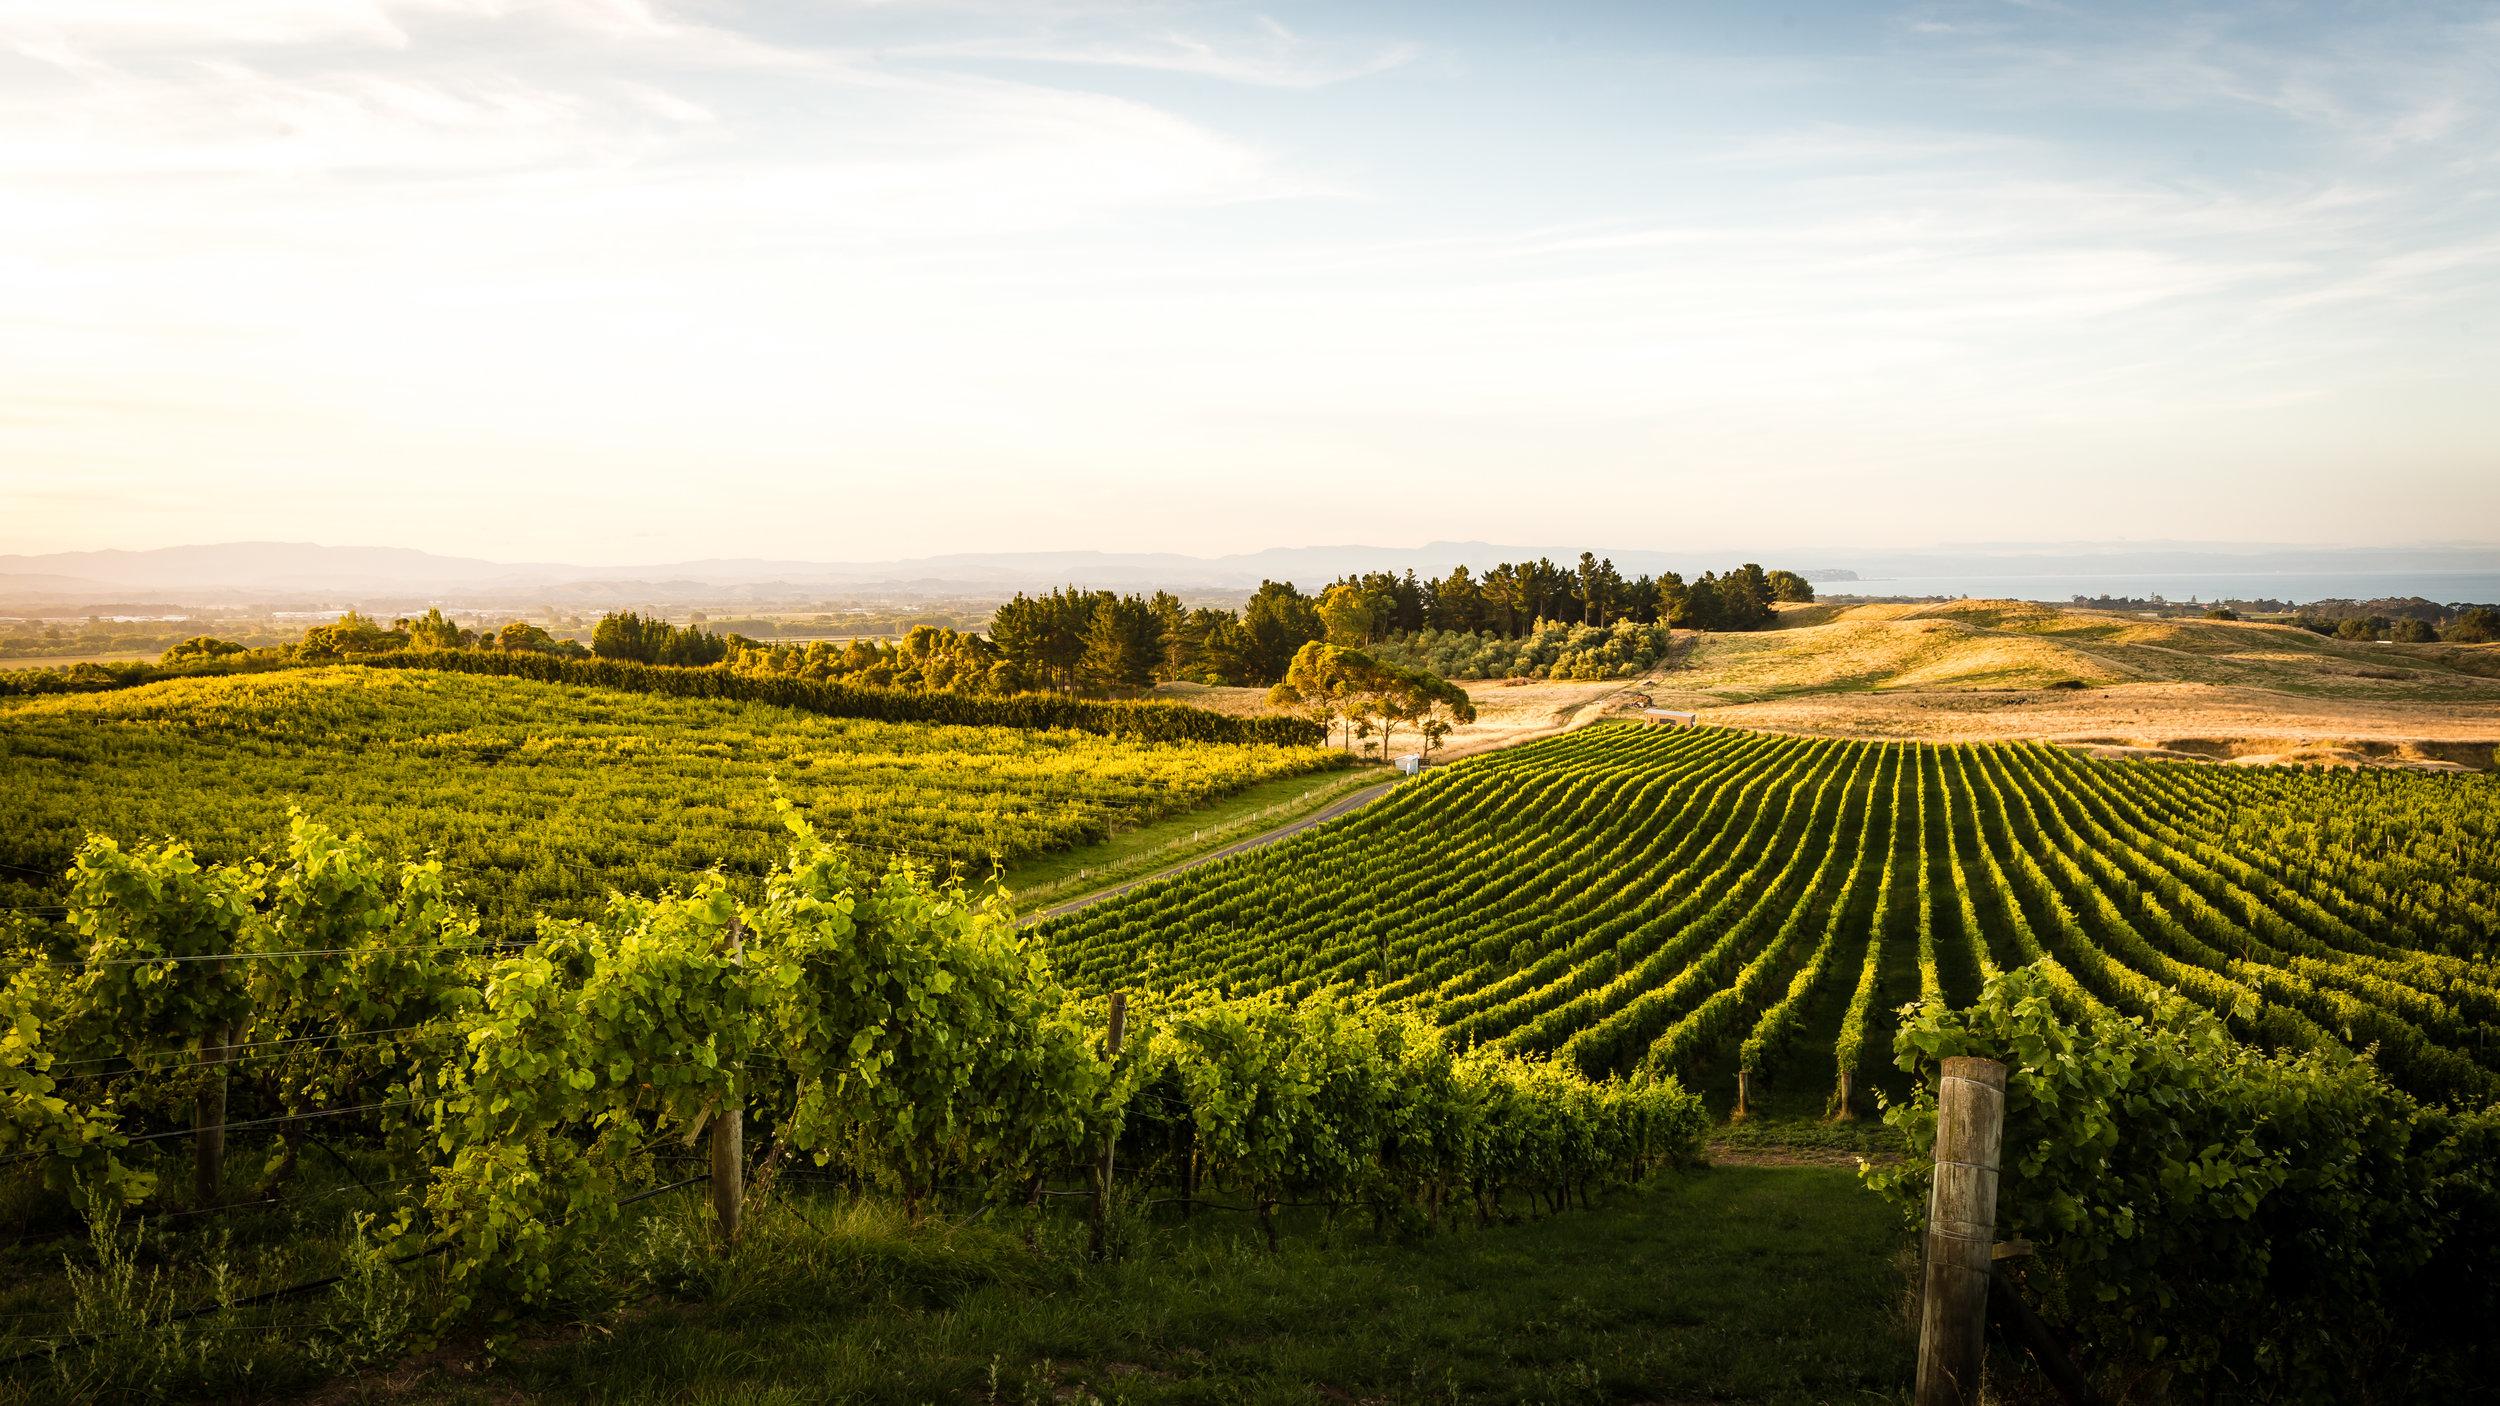 Golden hour over the vines